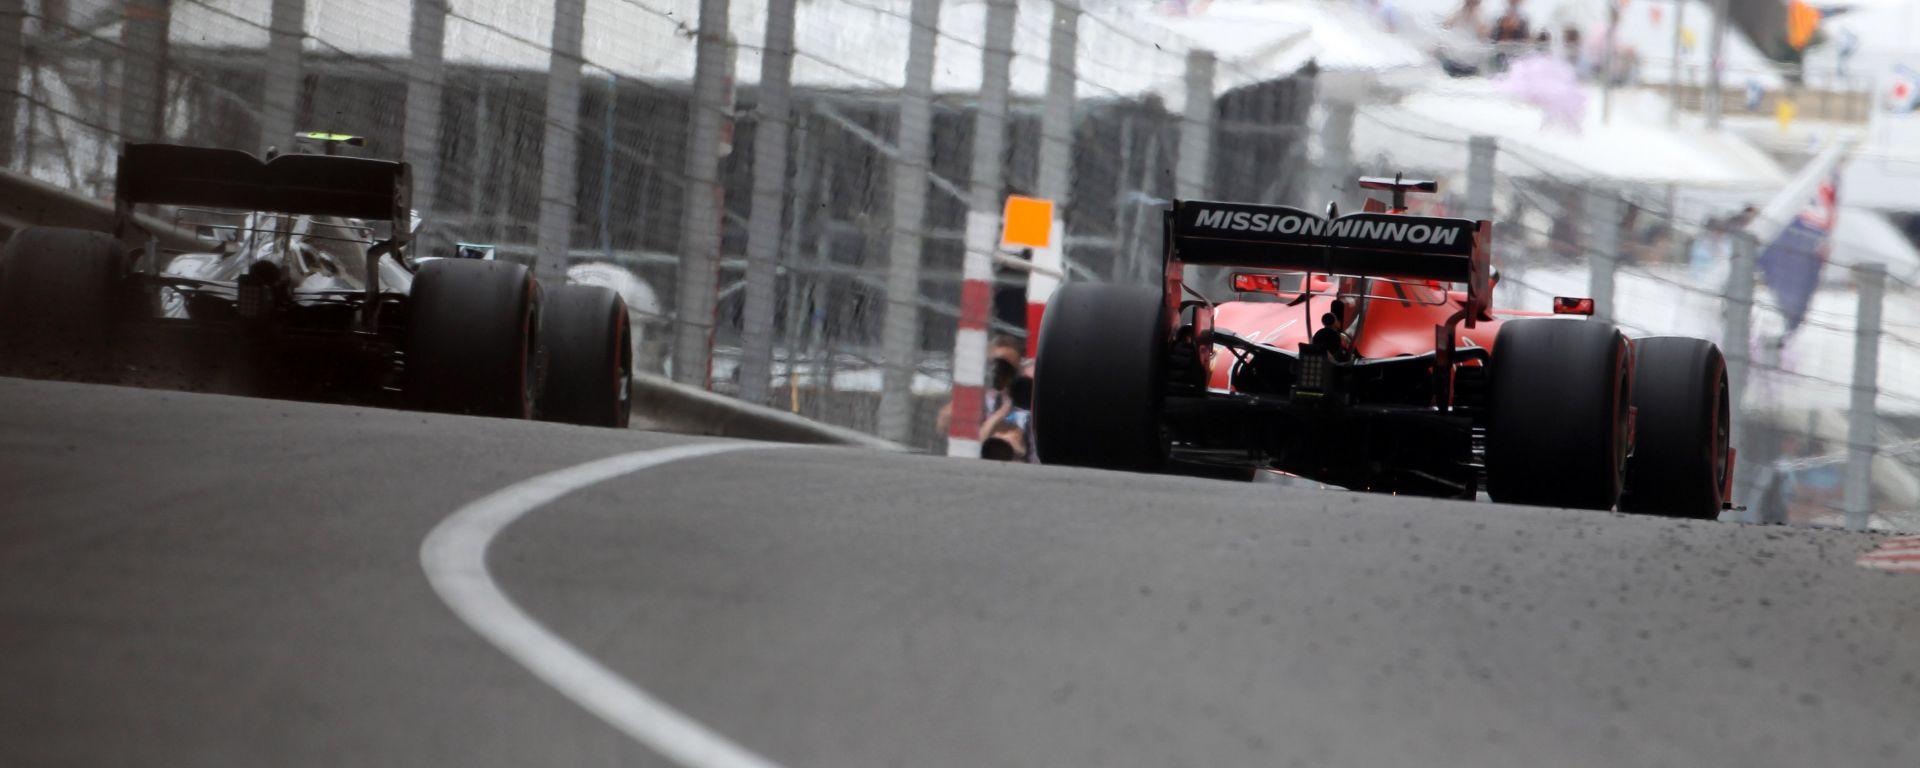 F1 2019, Mercedes e Ferrari appaiate a Monte Carlo